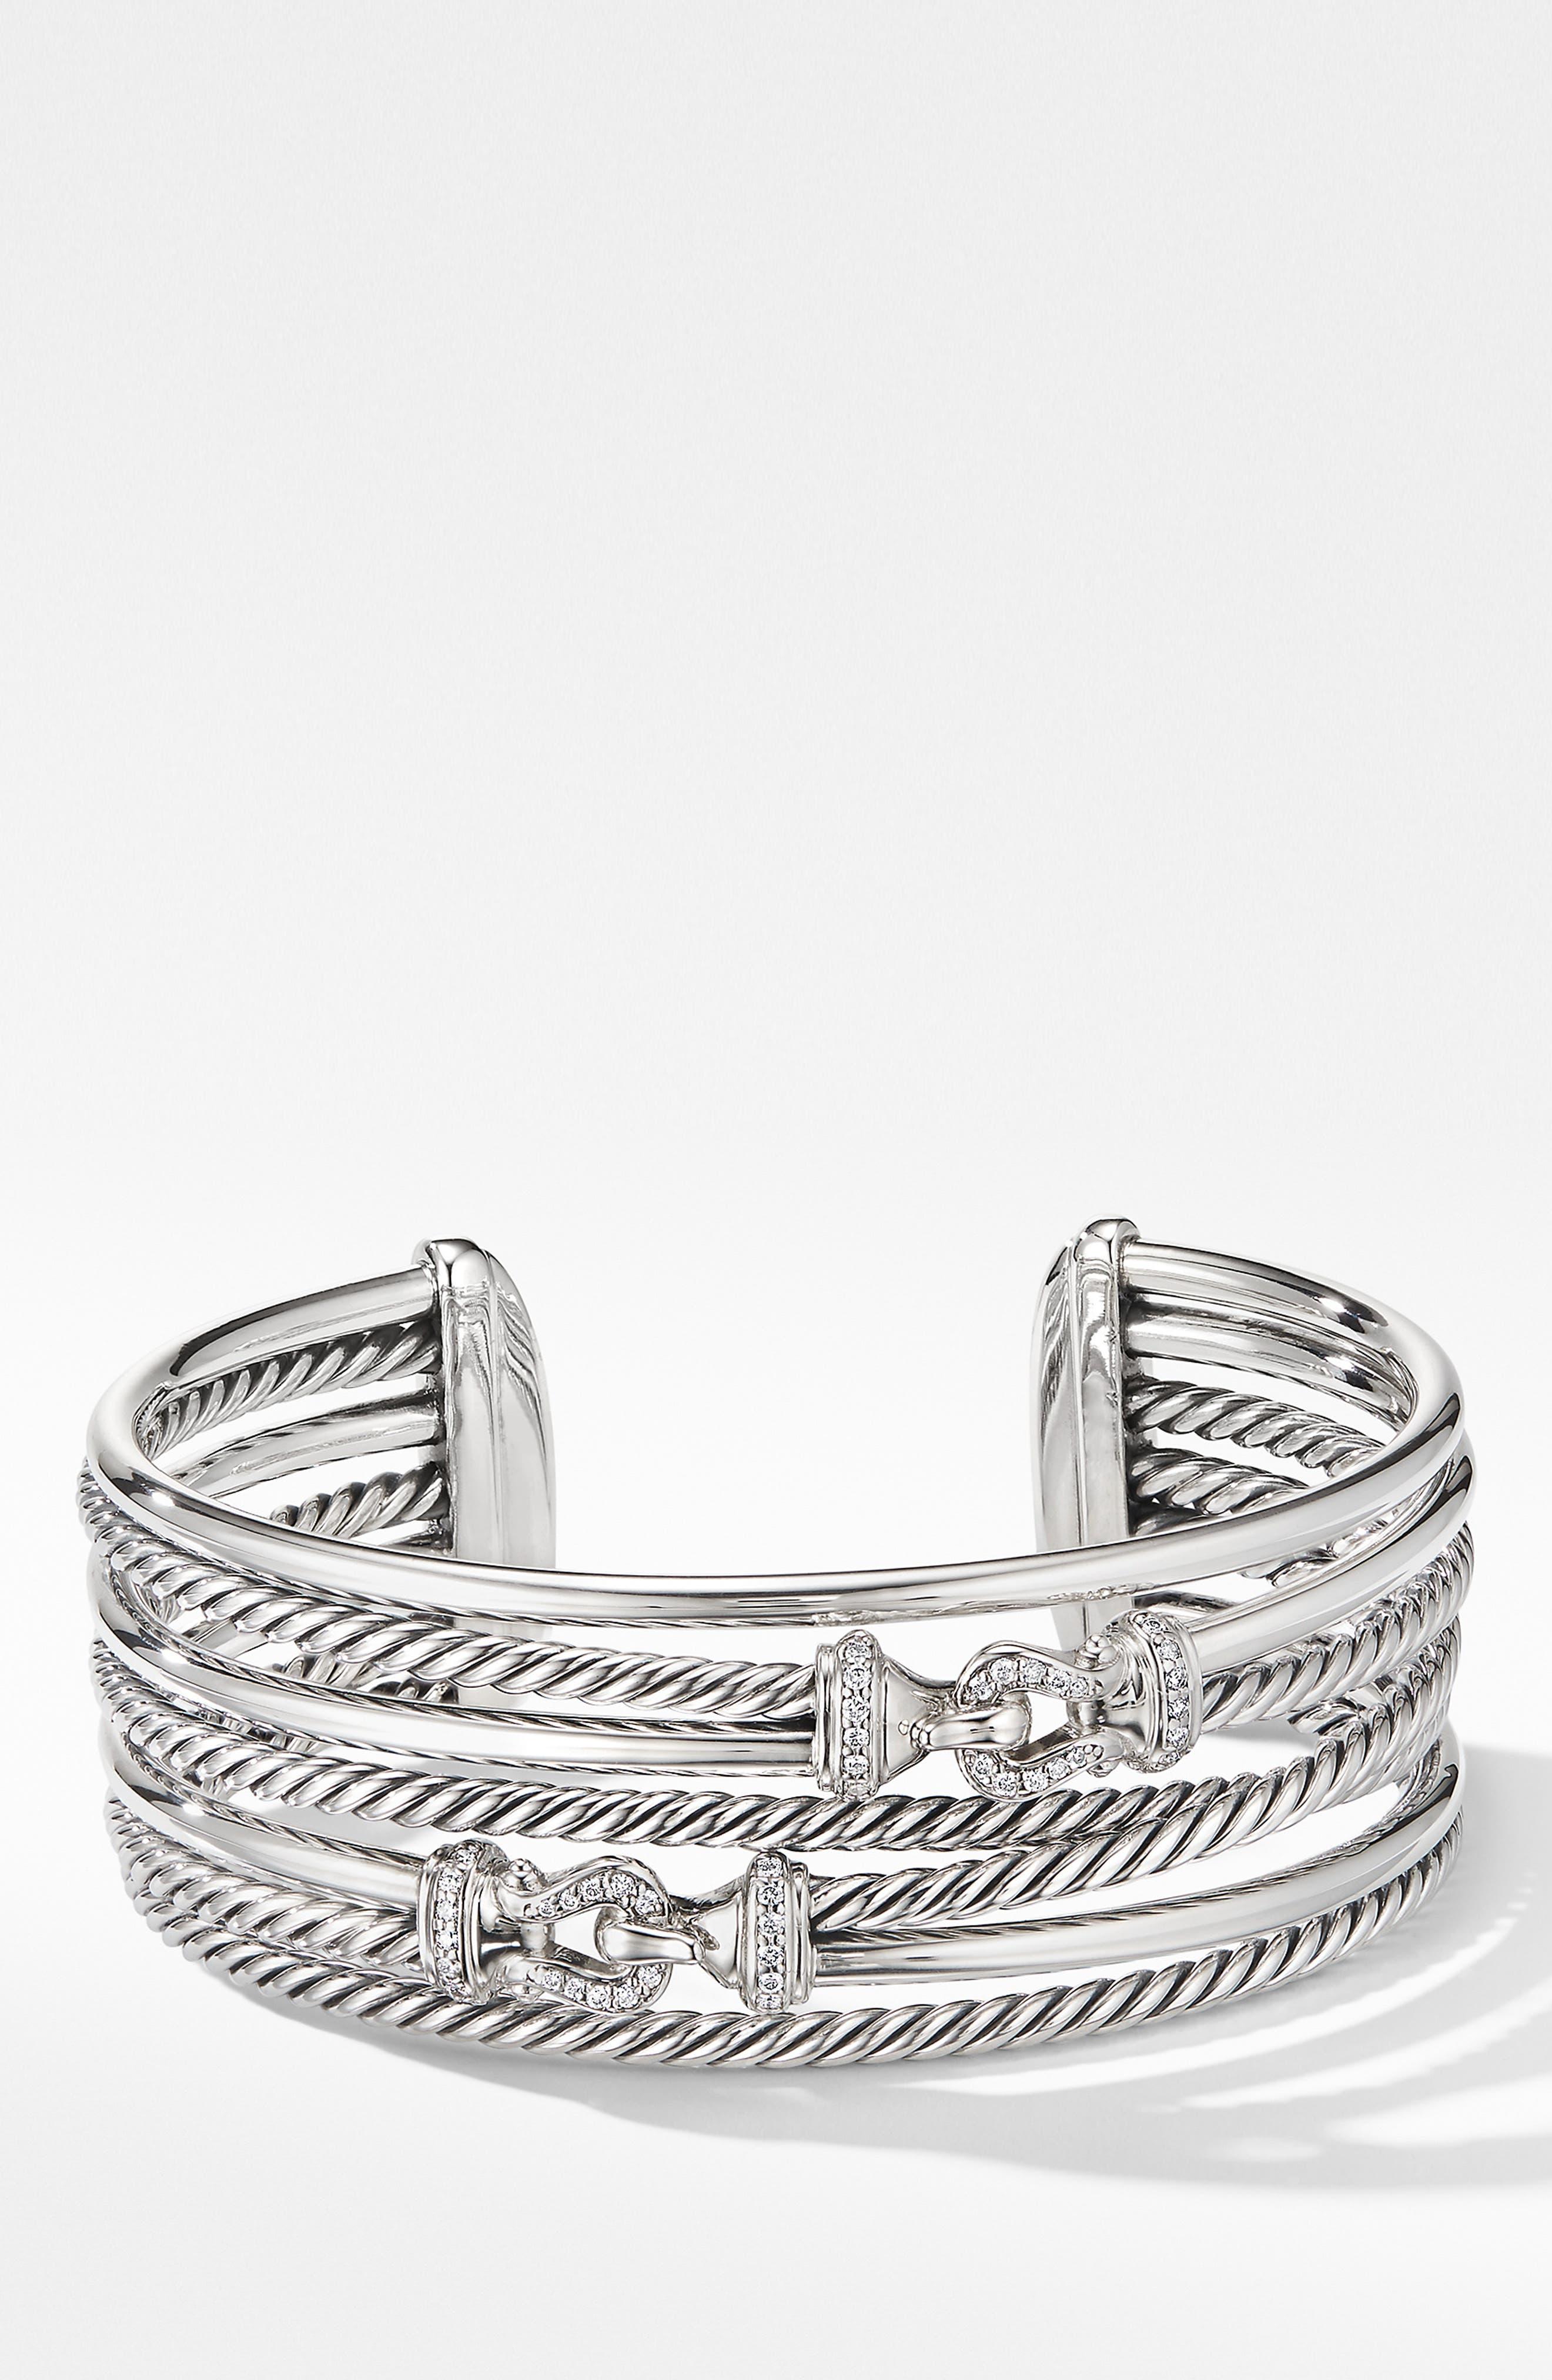 DAVID YURMAN, Buckle Crossover Cuff Bracelet with Diamonds, Main thumbnail 1, color, SILVER/ DIAMOND